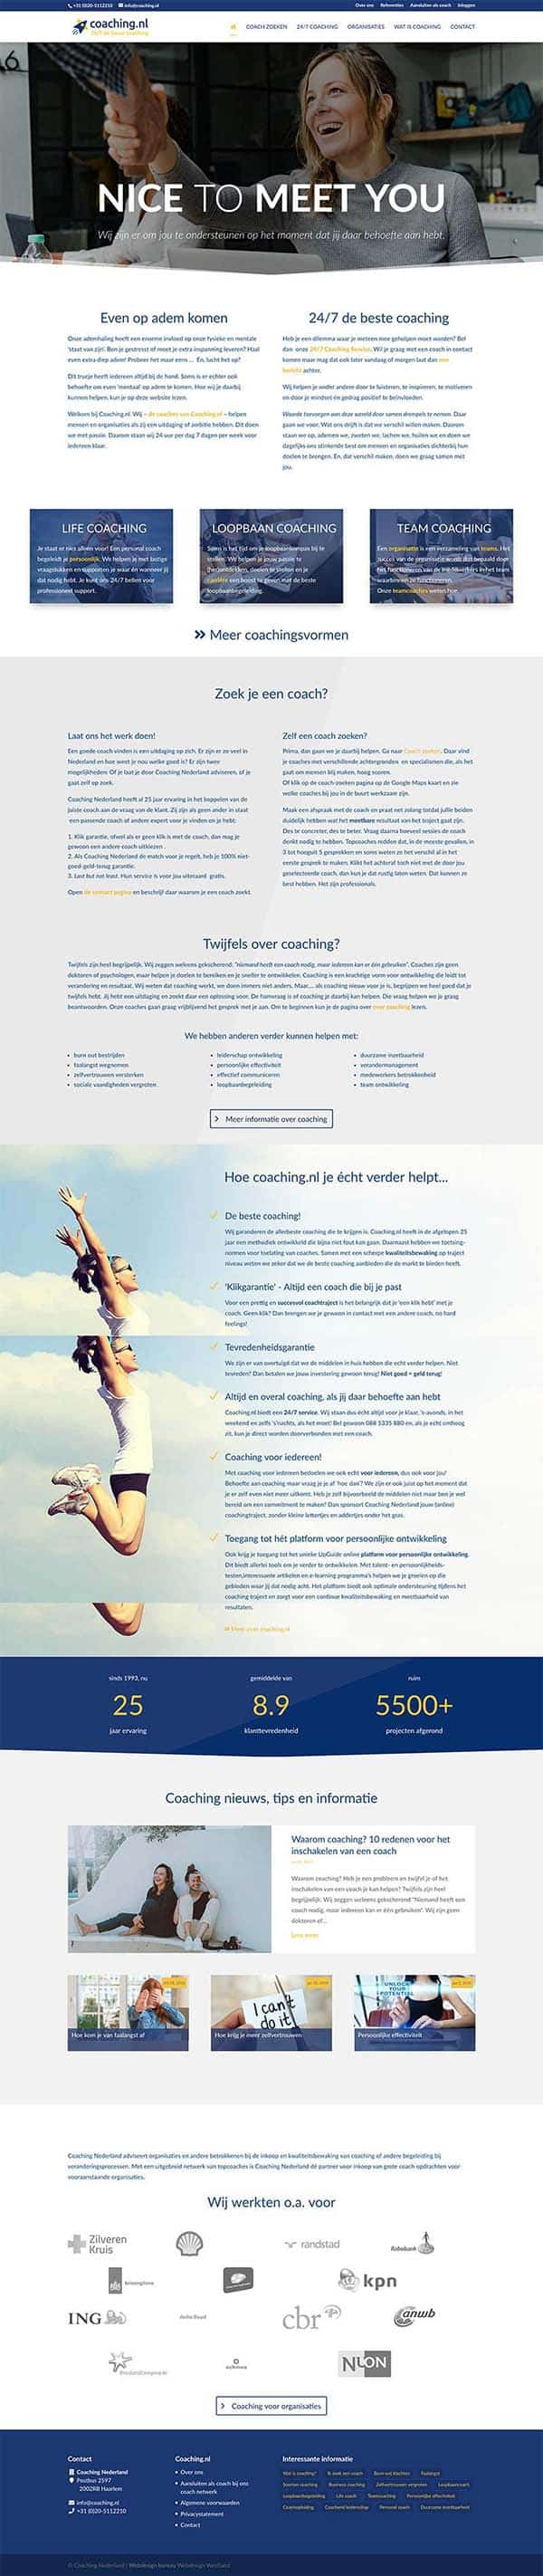 Webdesign bureau Westland maakt o.a. coaching.nl